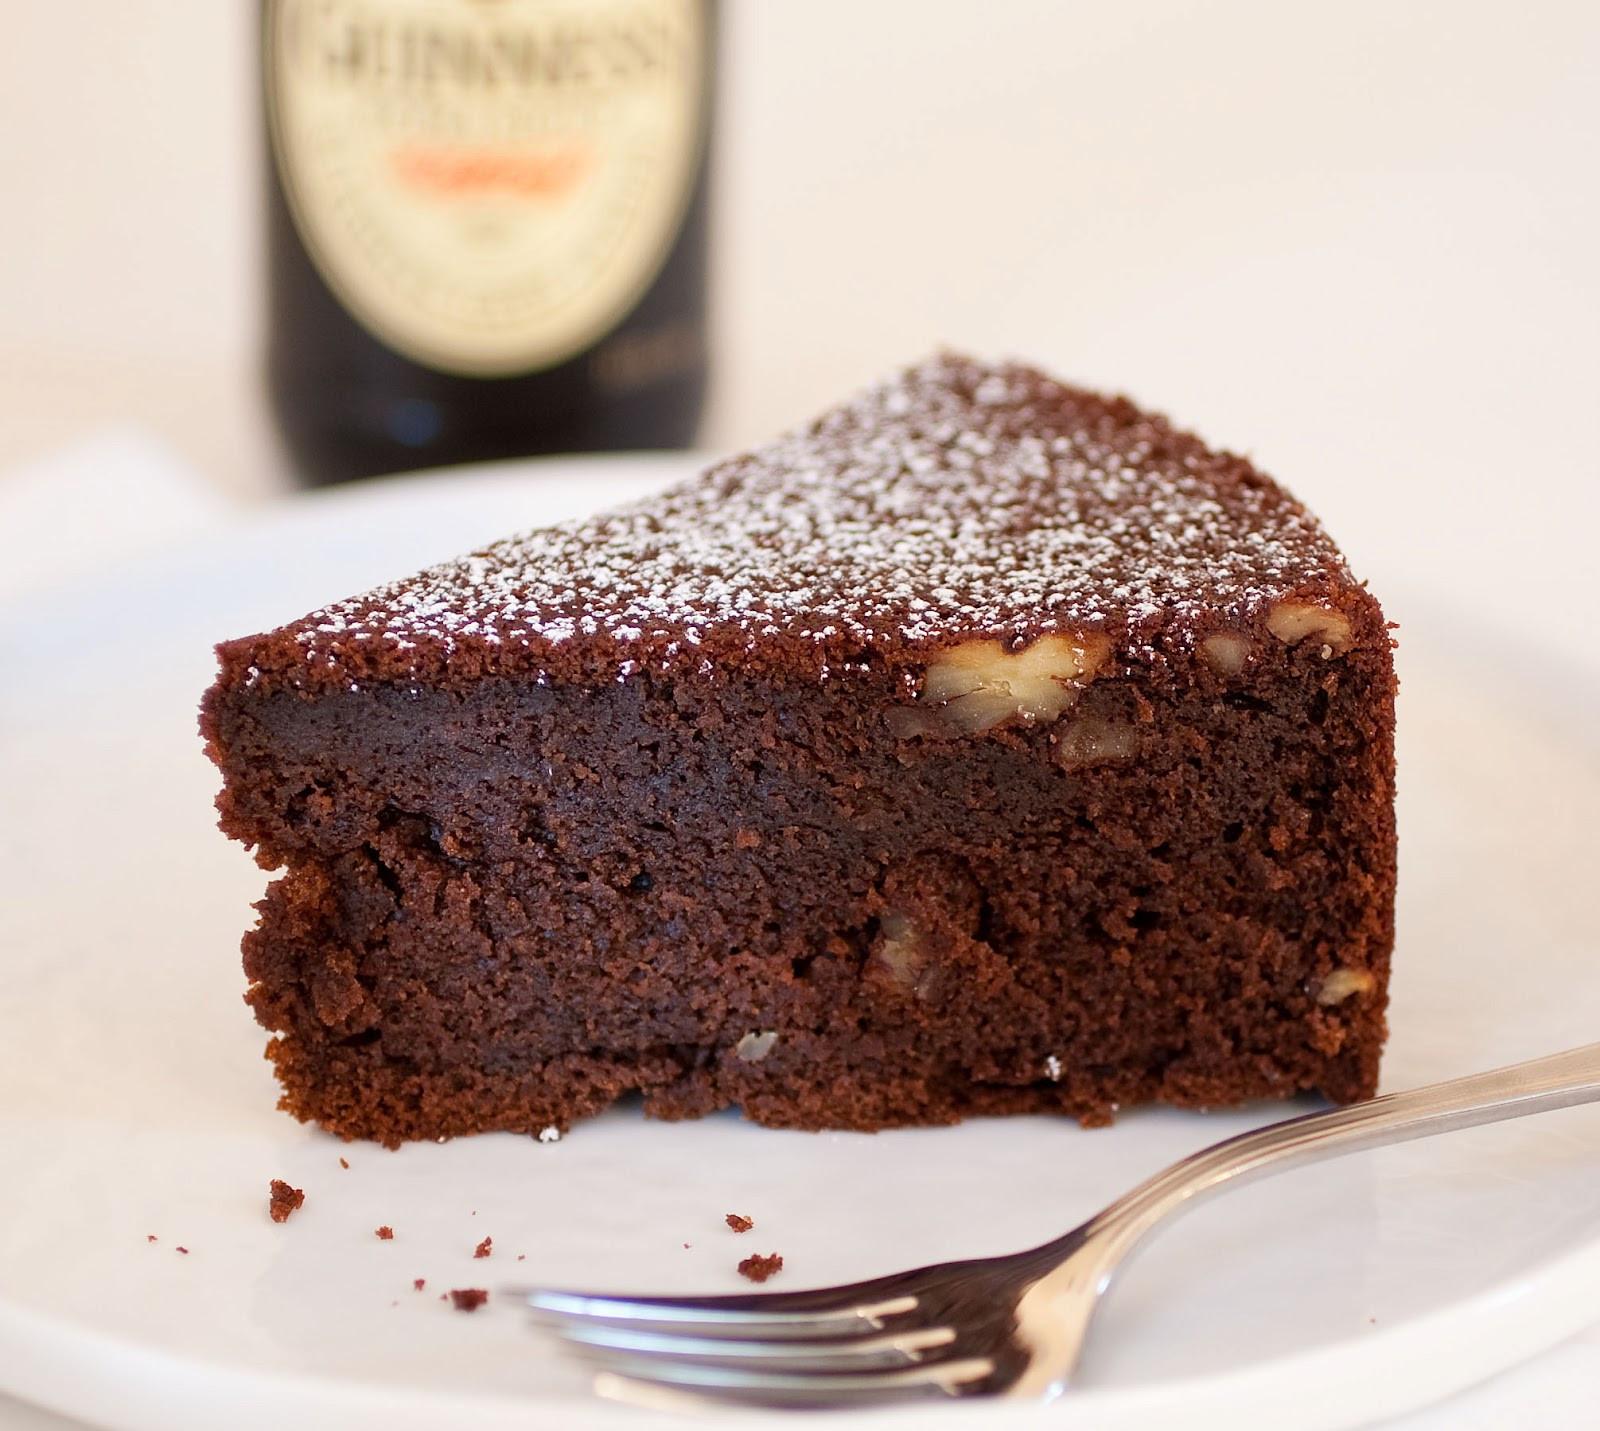 Chocolate Guinness Cake  Tish Boyle Sweet Dreams Chocolate Guinness Cake – St